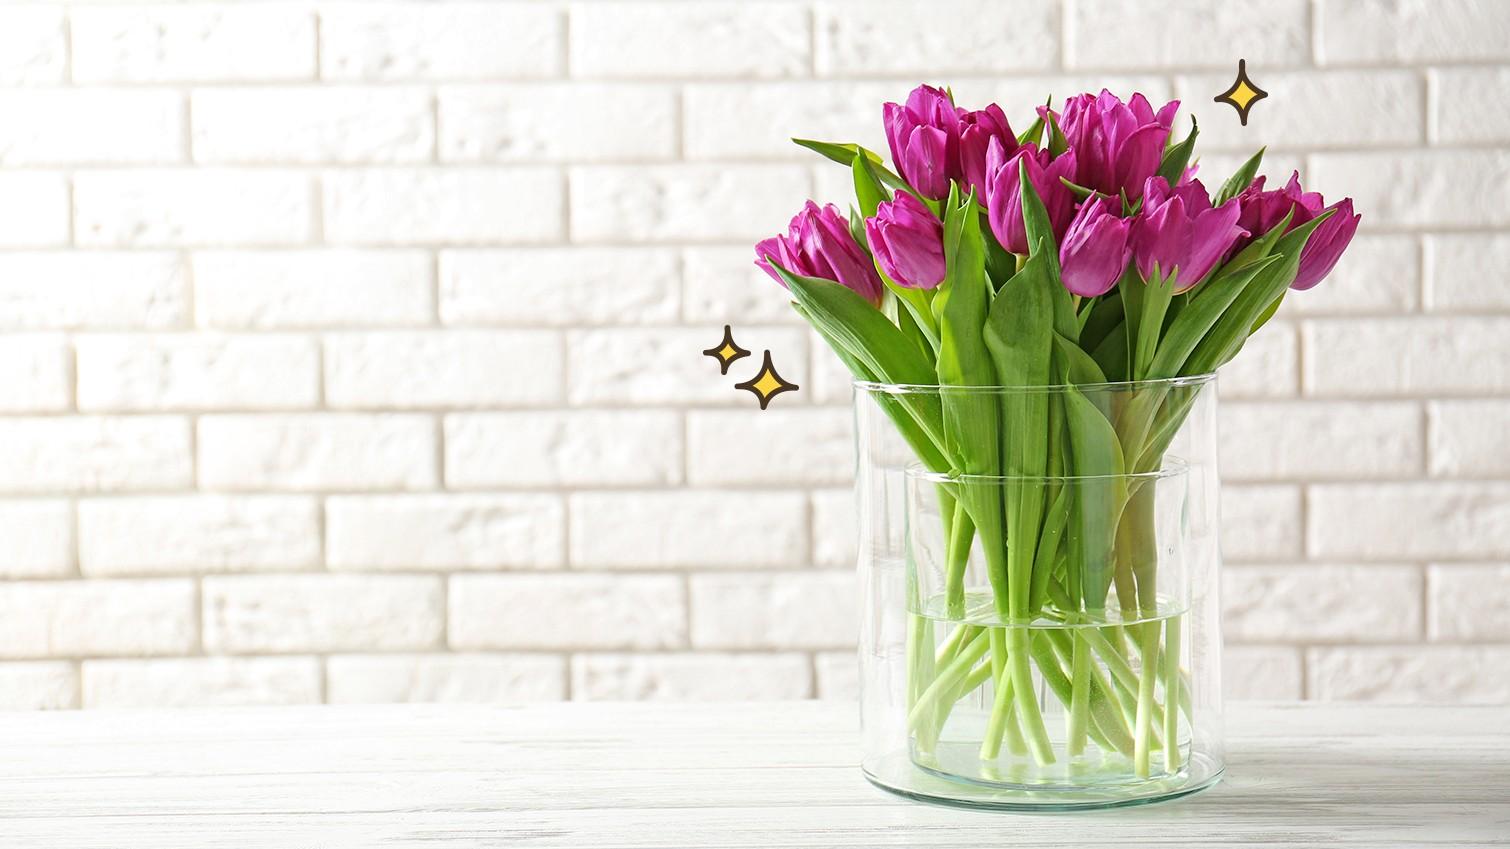 Tips Agar Bunga Di Vas Tetap Segar Dan Lebih Tahan Lama